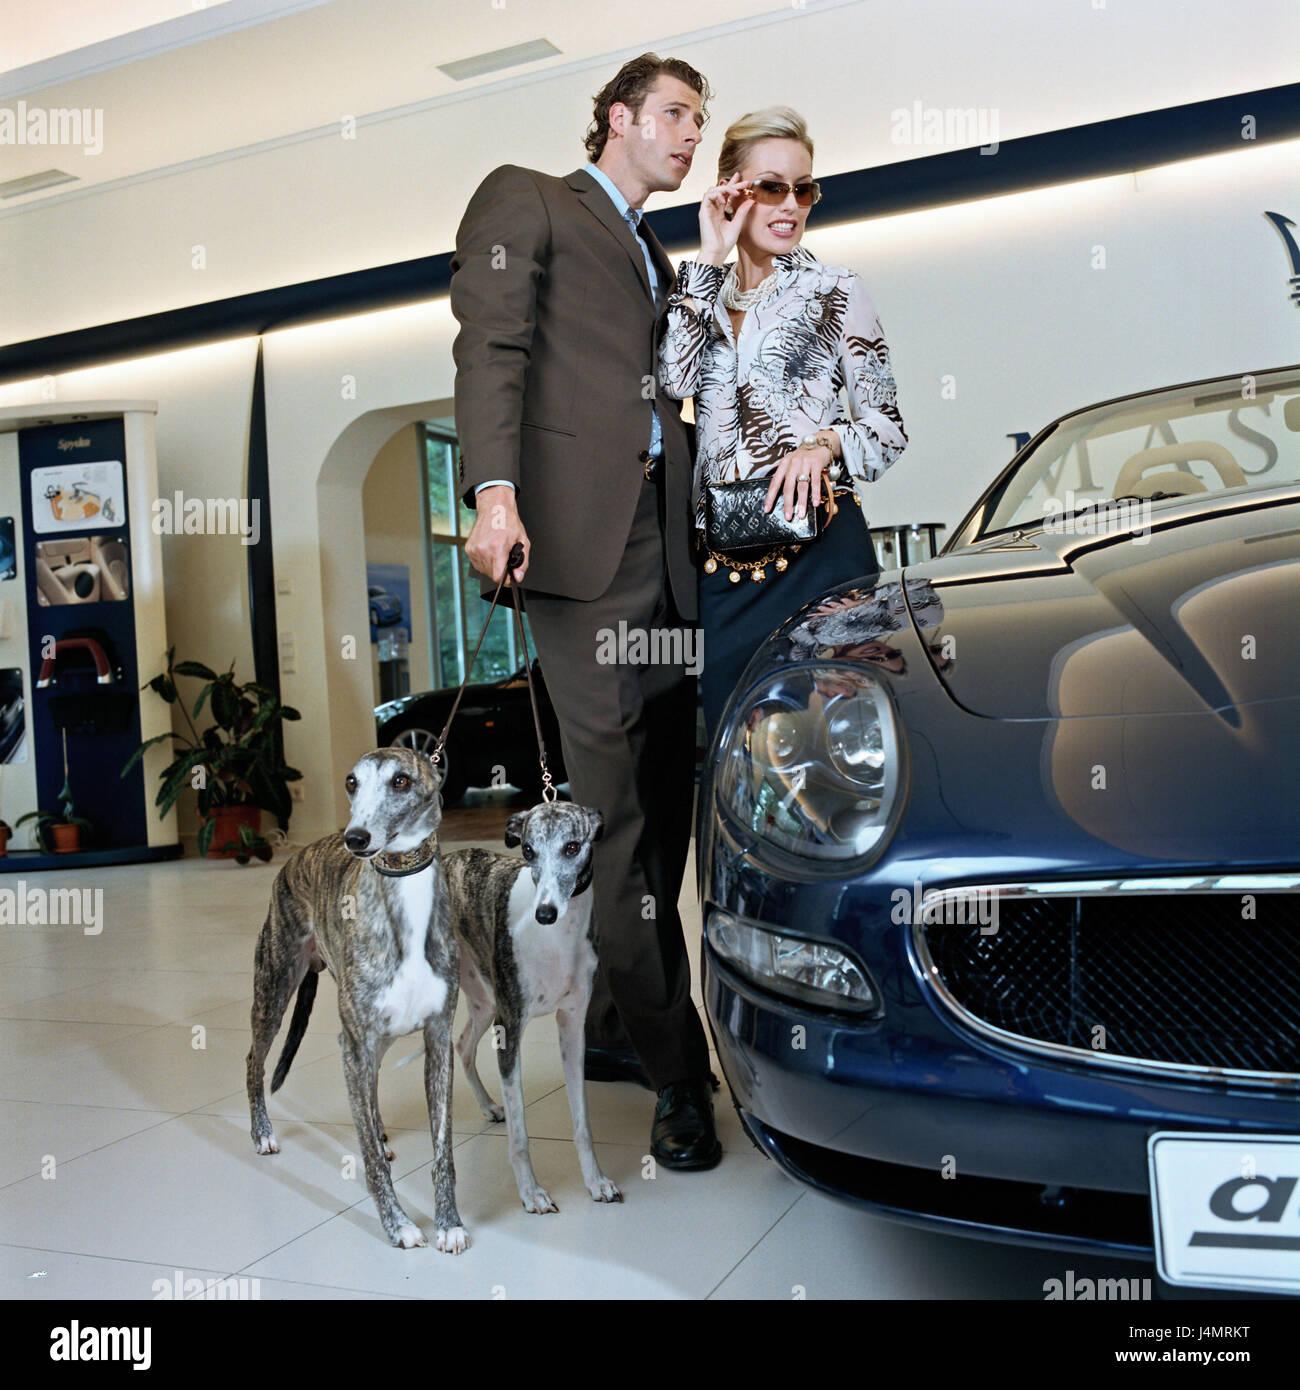 Car Dealer, Showroom, Couple, Elegantly, Car, Look, Dogs